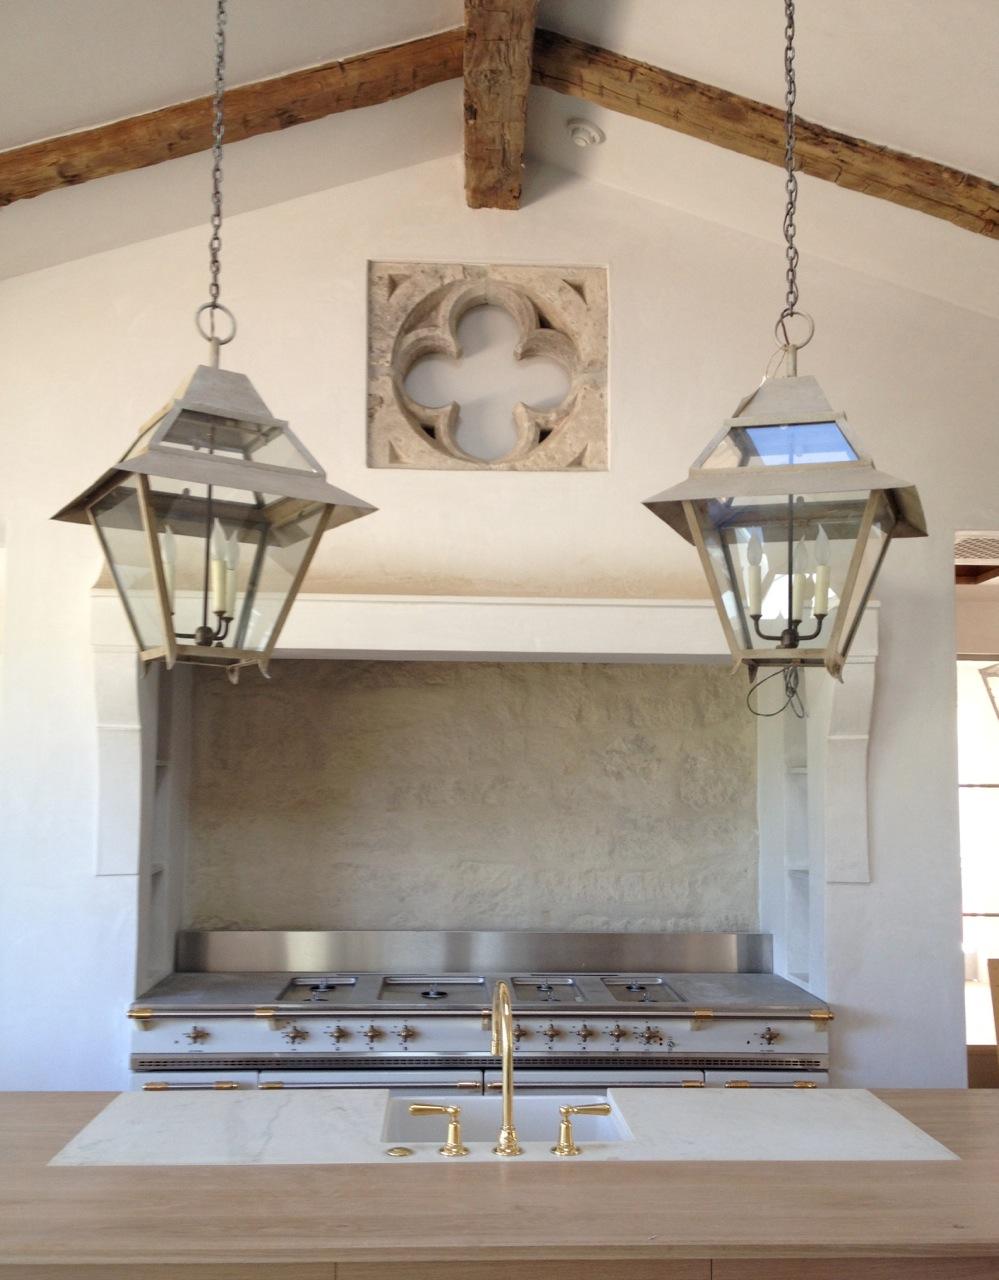 patina farm update kitchen lights plumbing fixtures and marble kitchen lantern lights IMG